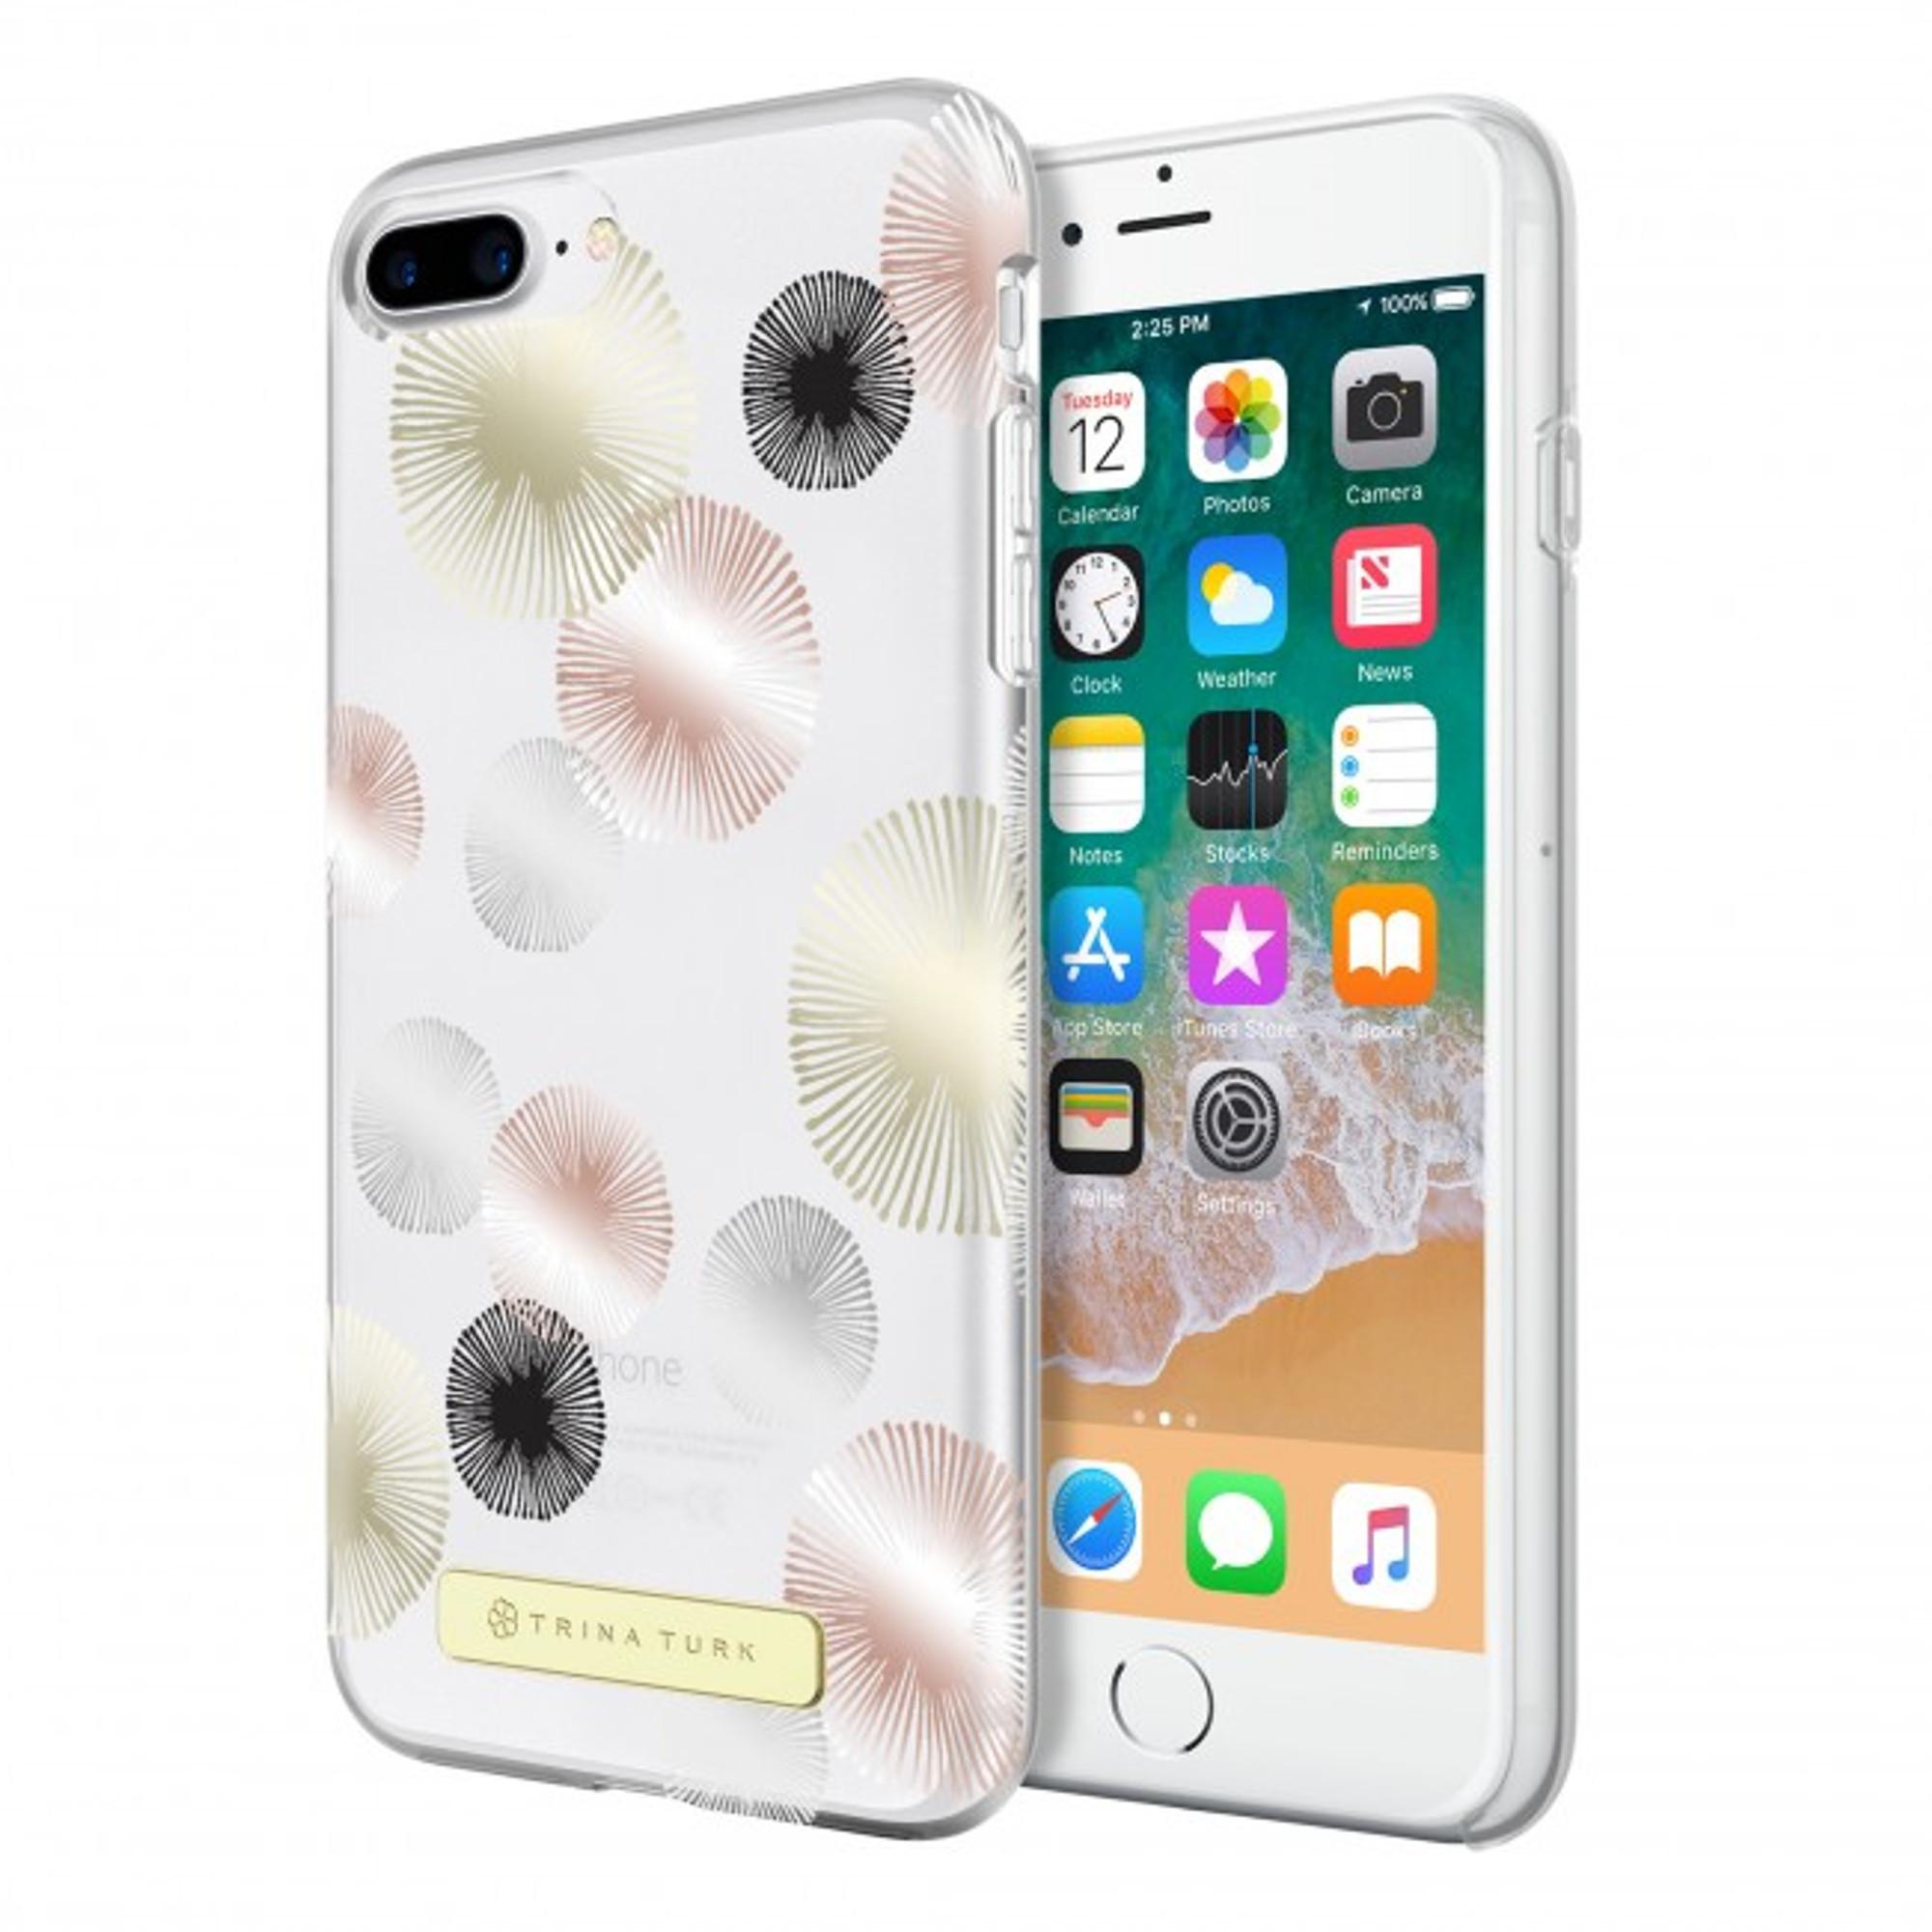 Trina Turk Translucent Case 1 Pc For Iphone 8 Iphone 7 Iphone 66s Fireworks Gold Foilrose Gold Foil Silver Foilblackclear